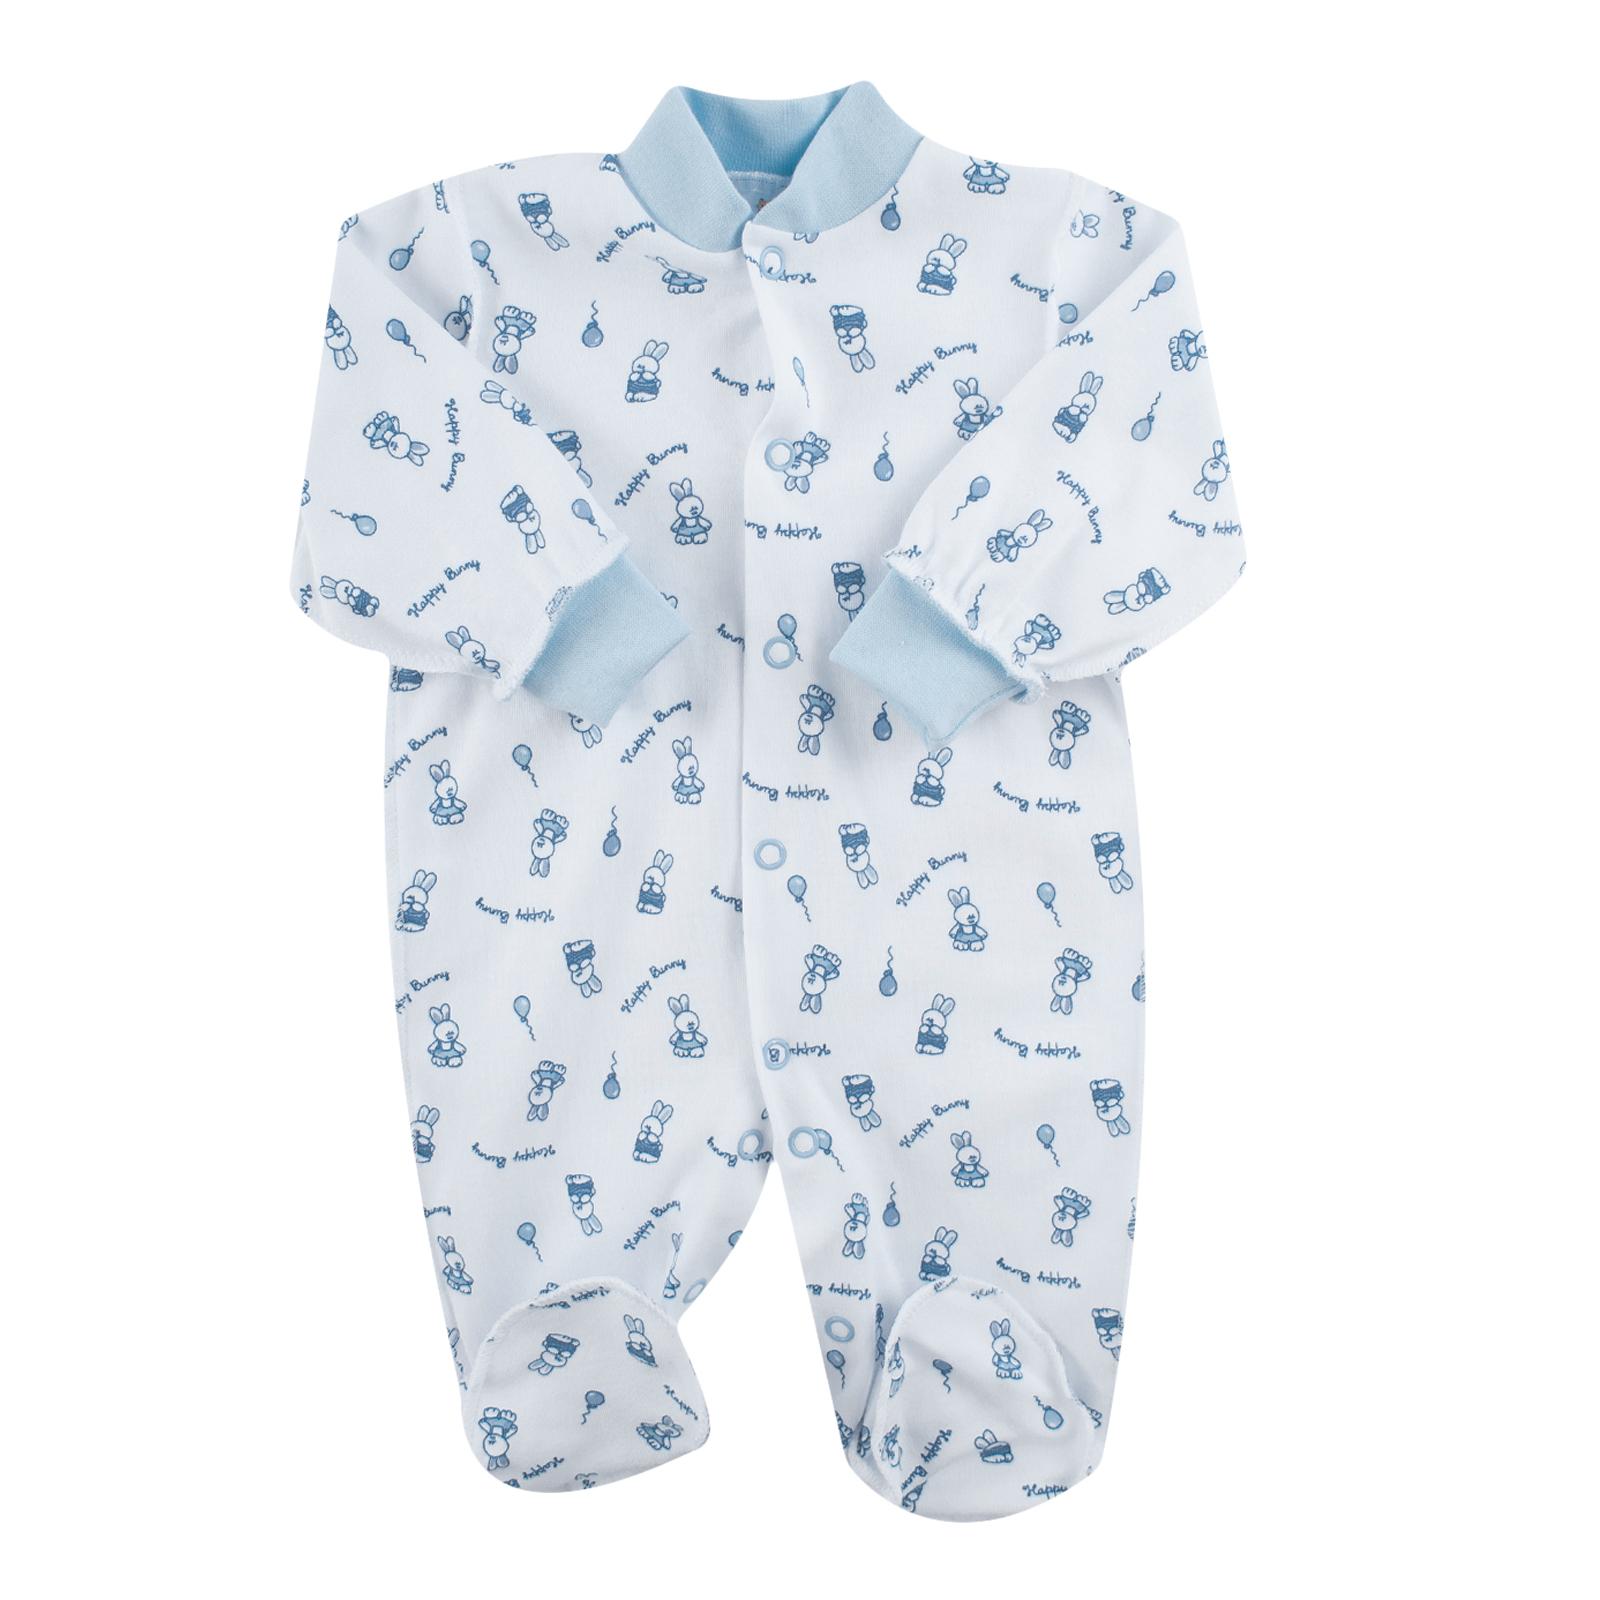 Комбинезон КОТМАРКОТ для мальчика, цвет набивка голубой тон 1-3 мес (размер 62)